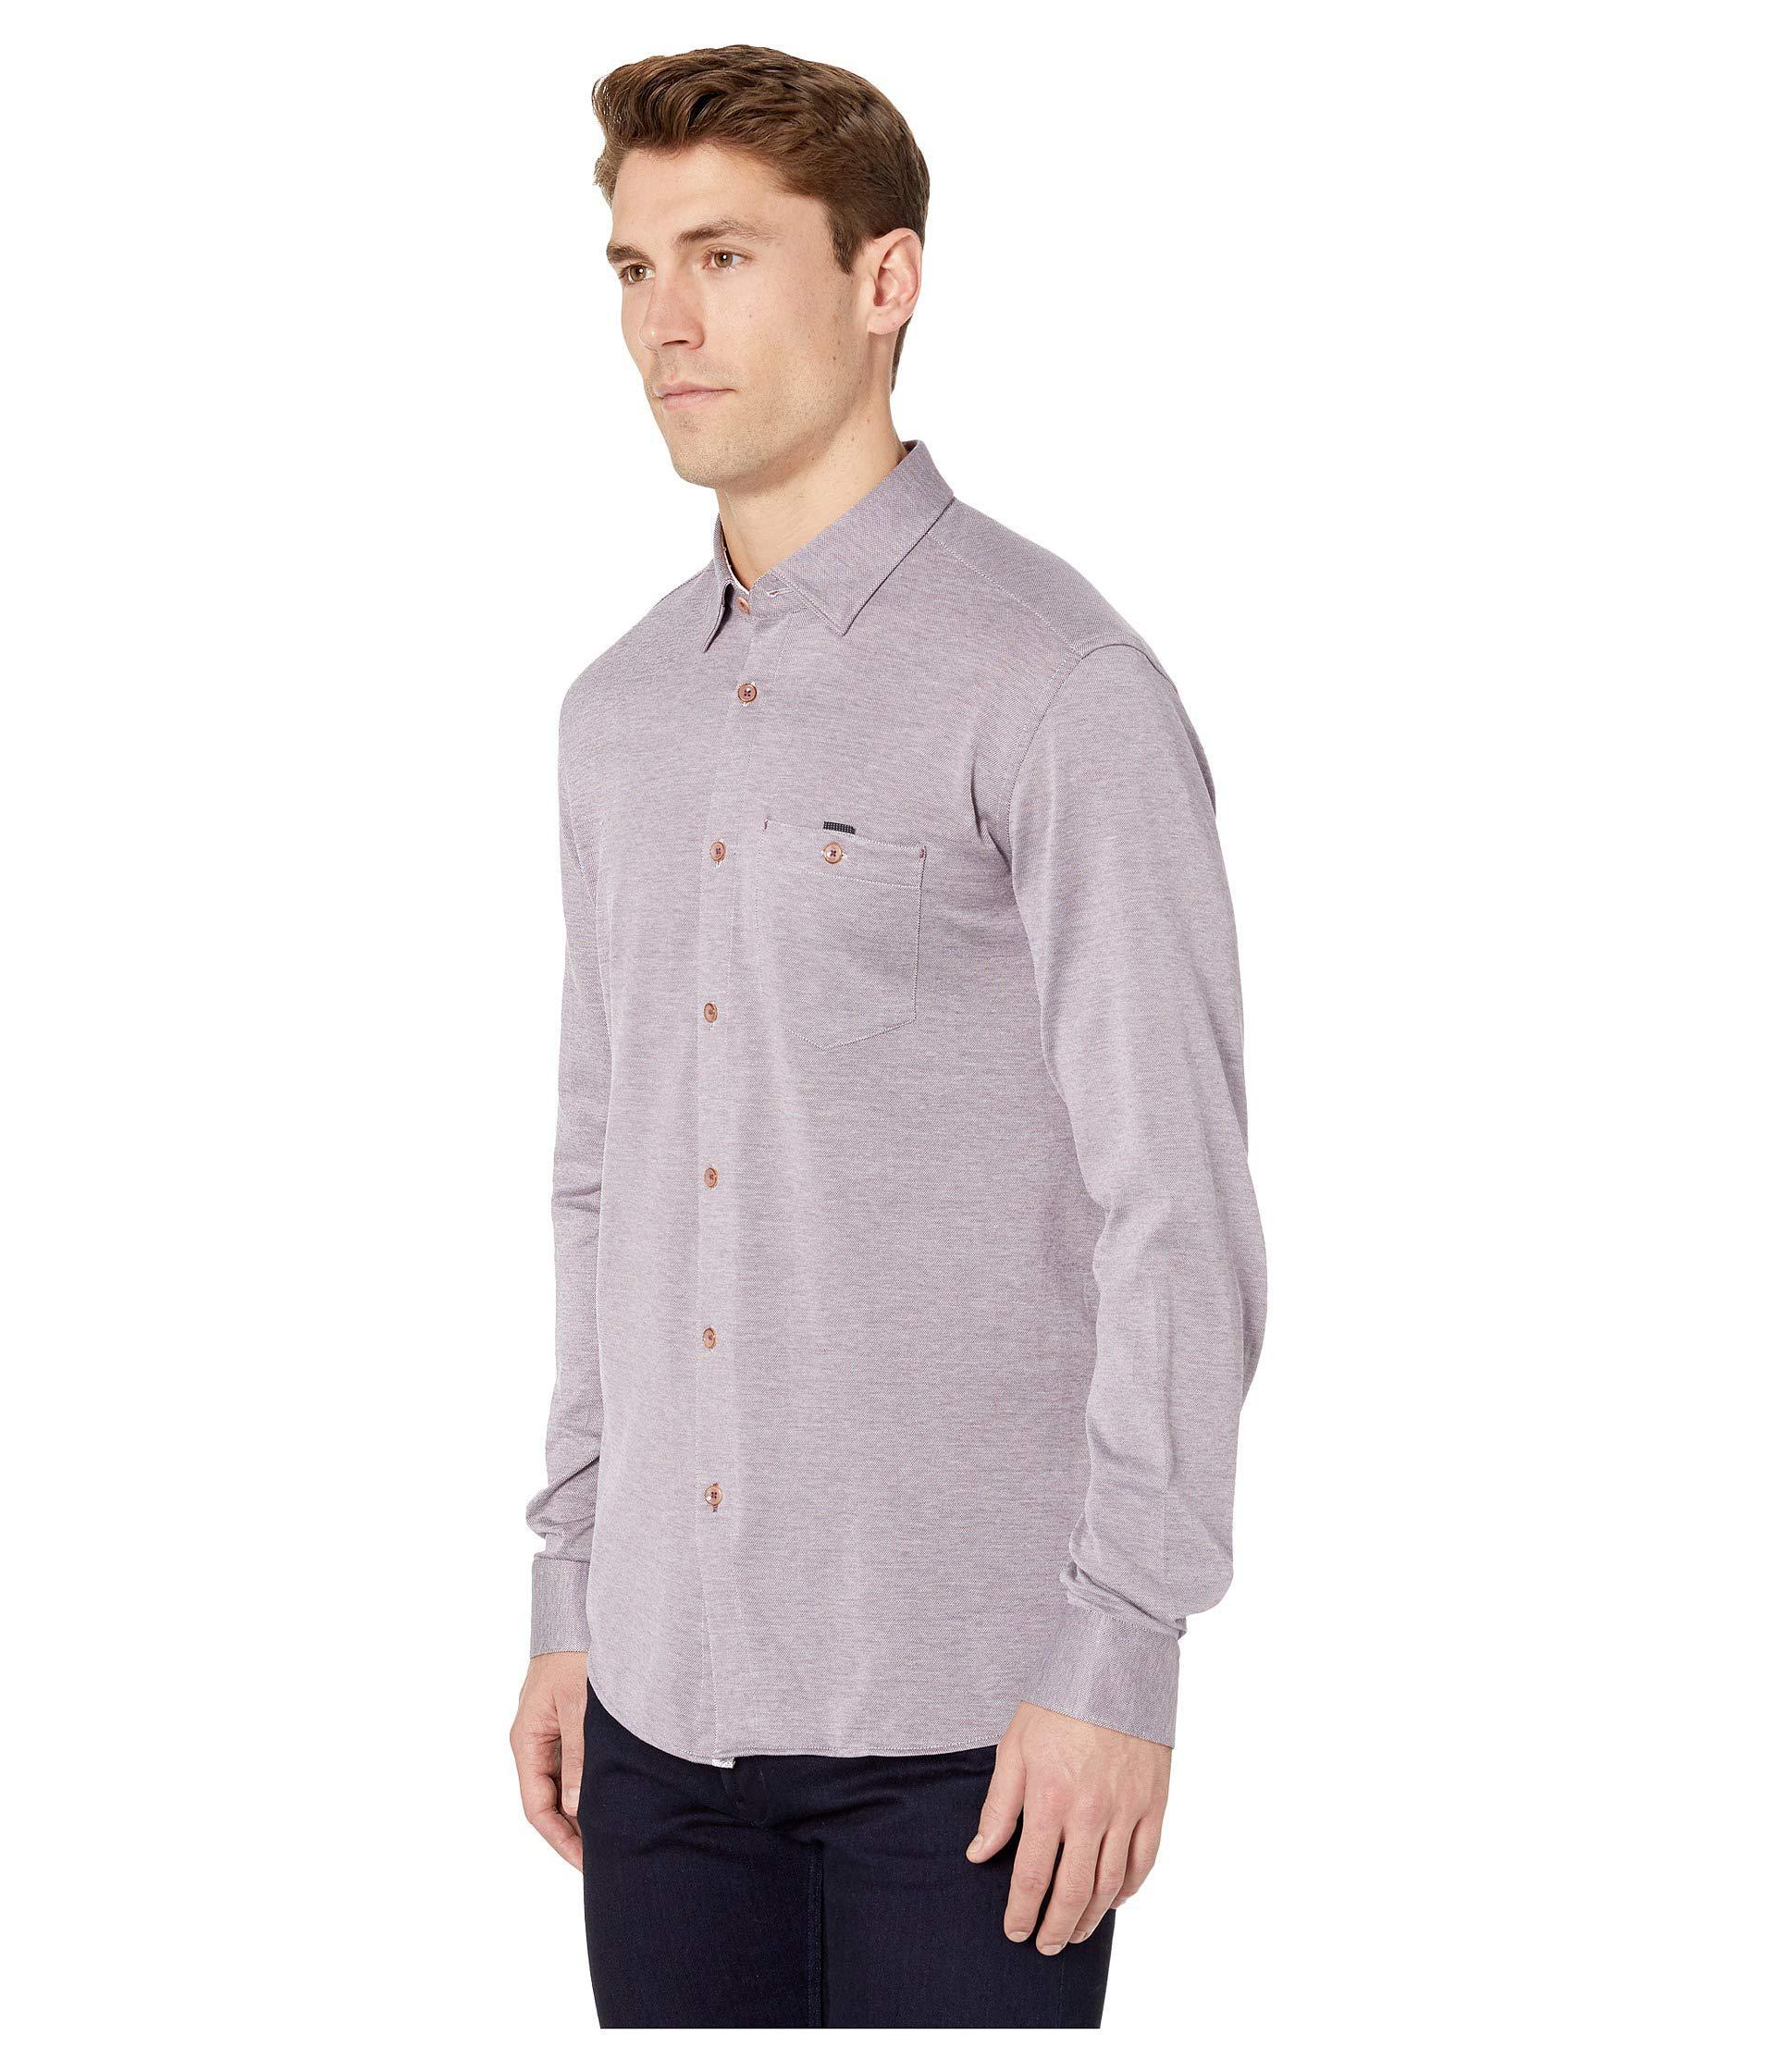 c513011711f3de Lyst - Ted Baker Timothy Long Sleeve Jersey Shirt (purple) Men s Clothing  in Purple for Men